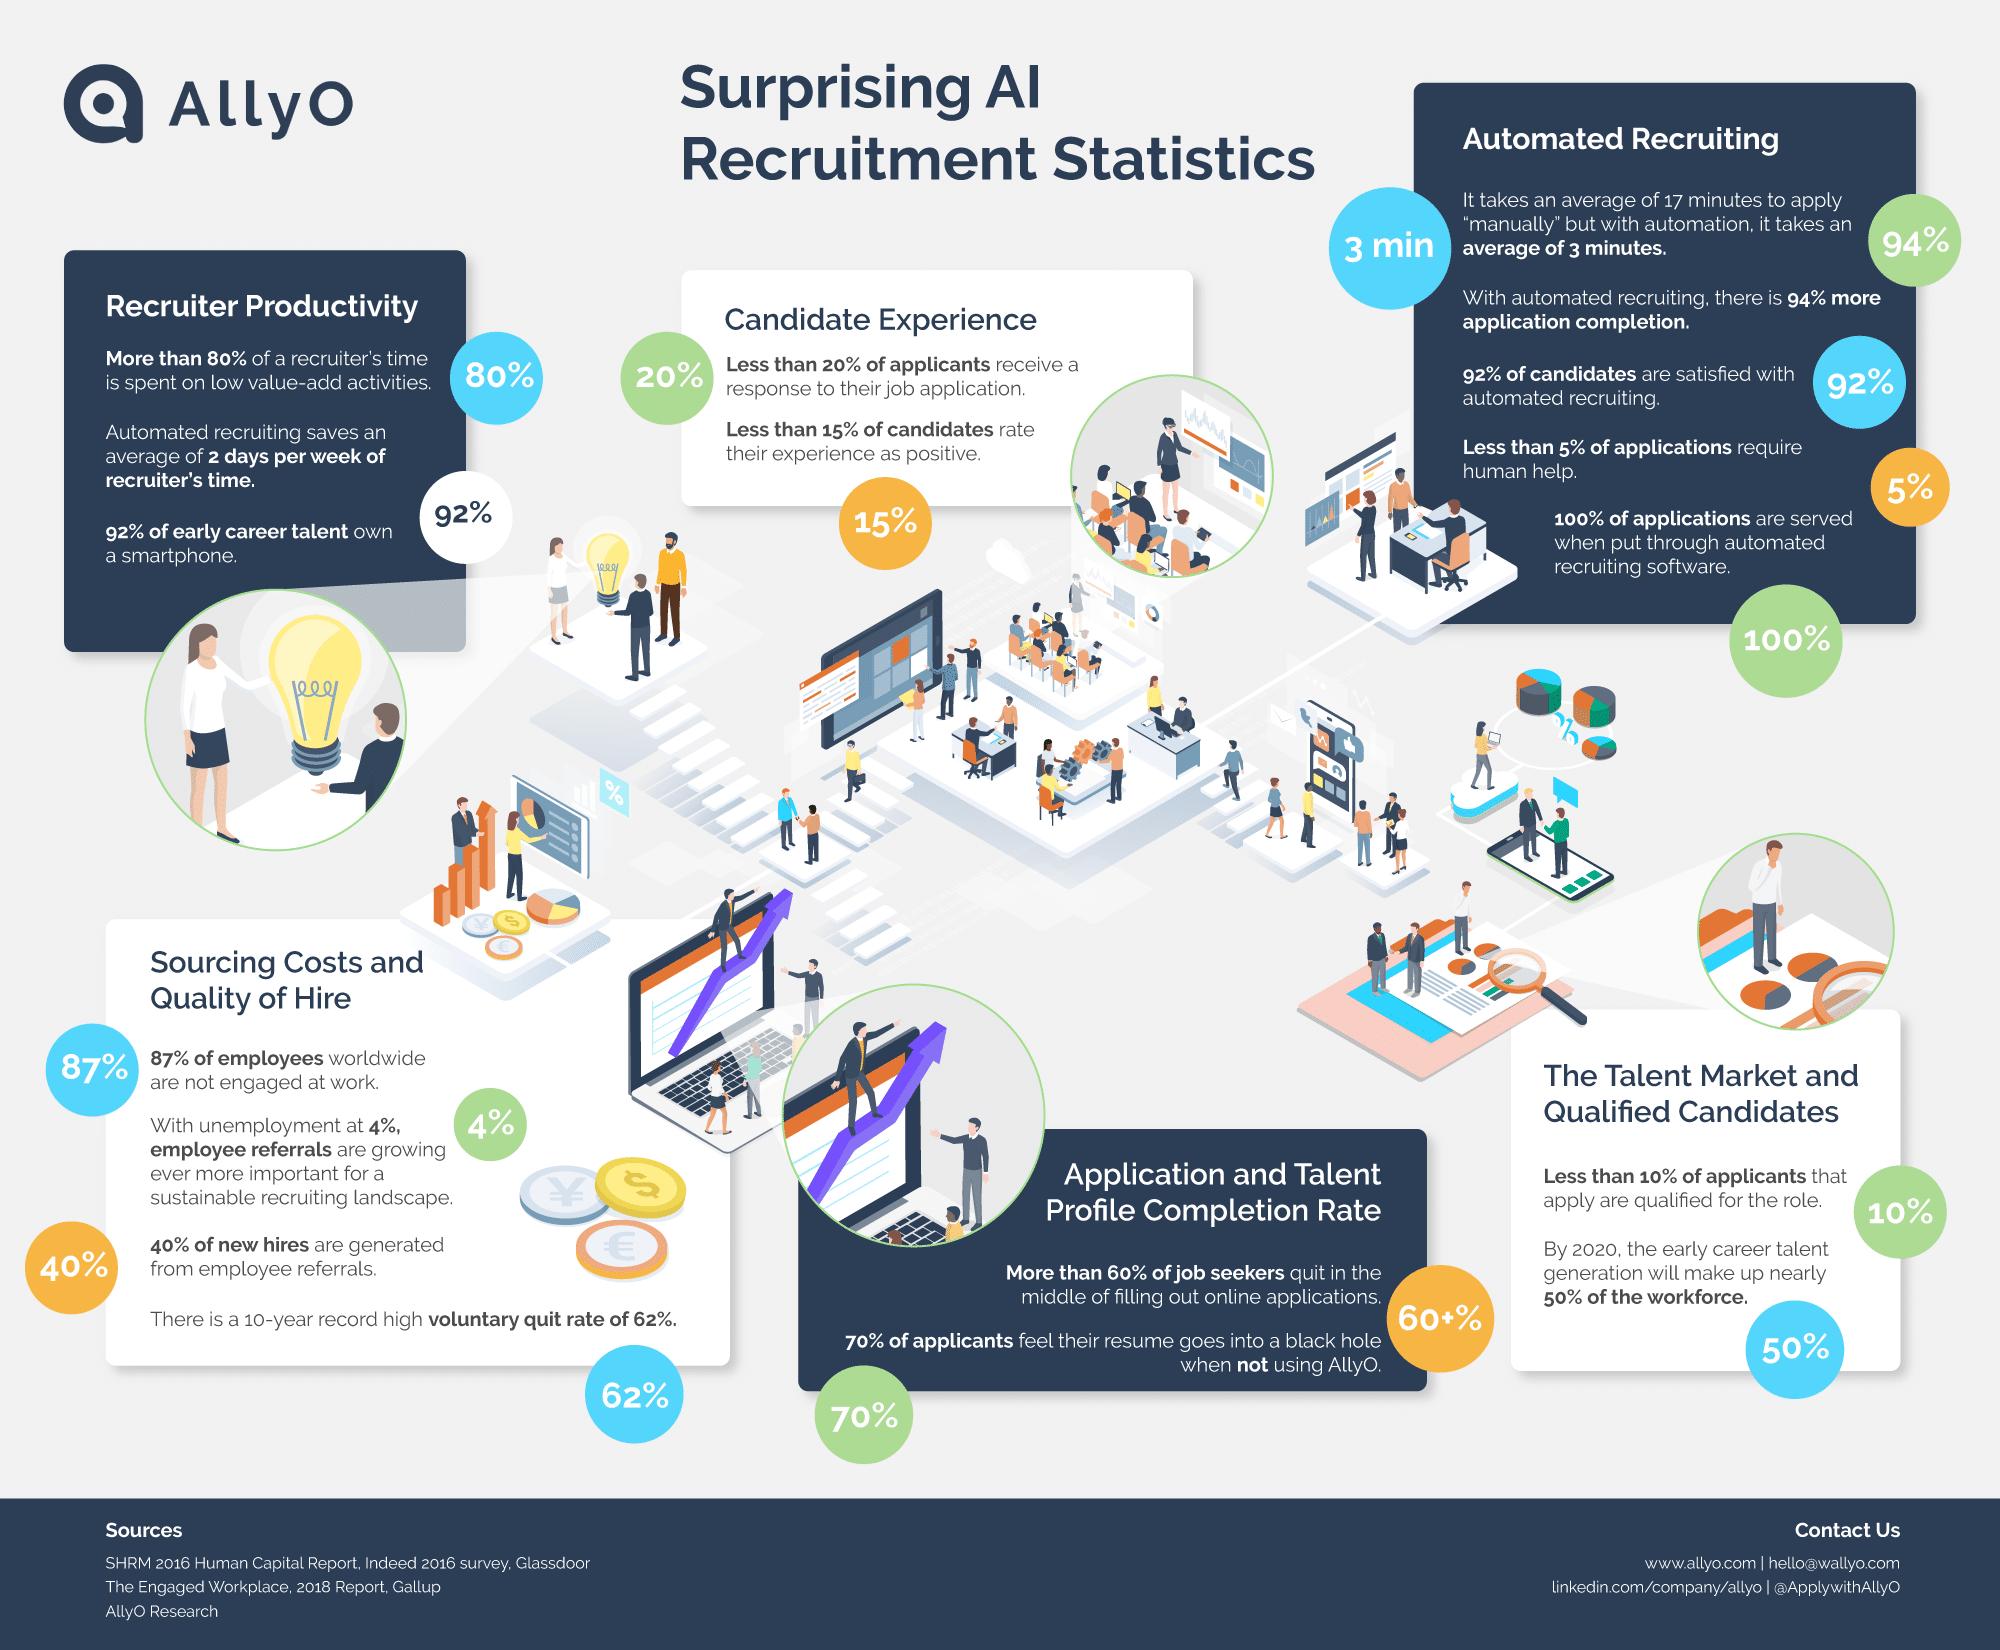 ai recruitment infographic 2018